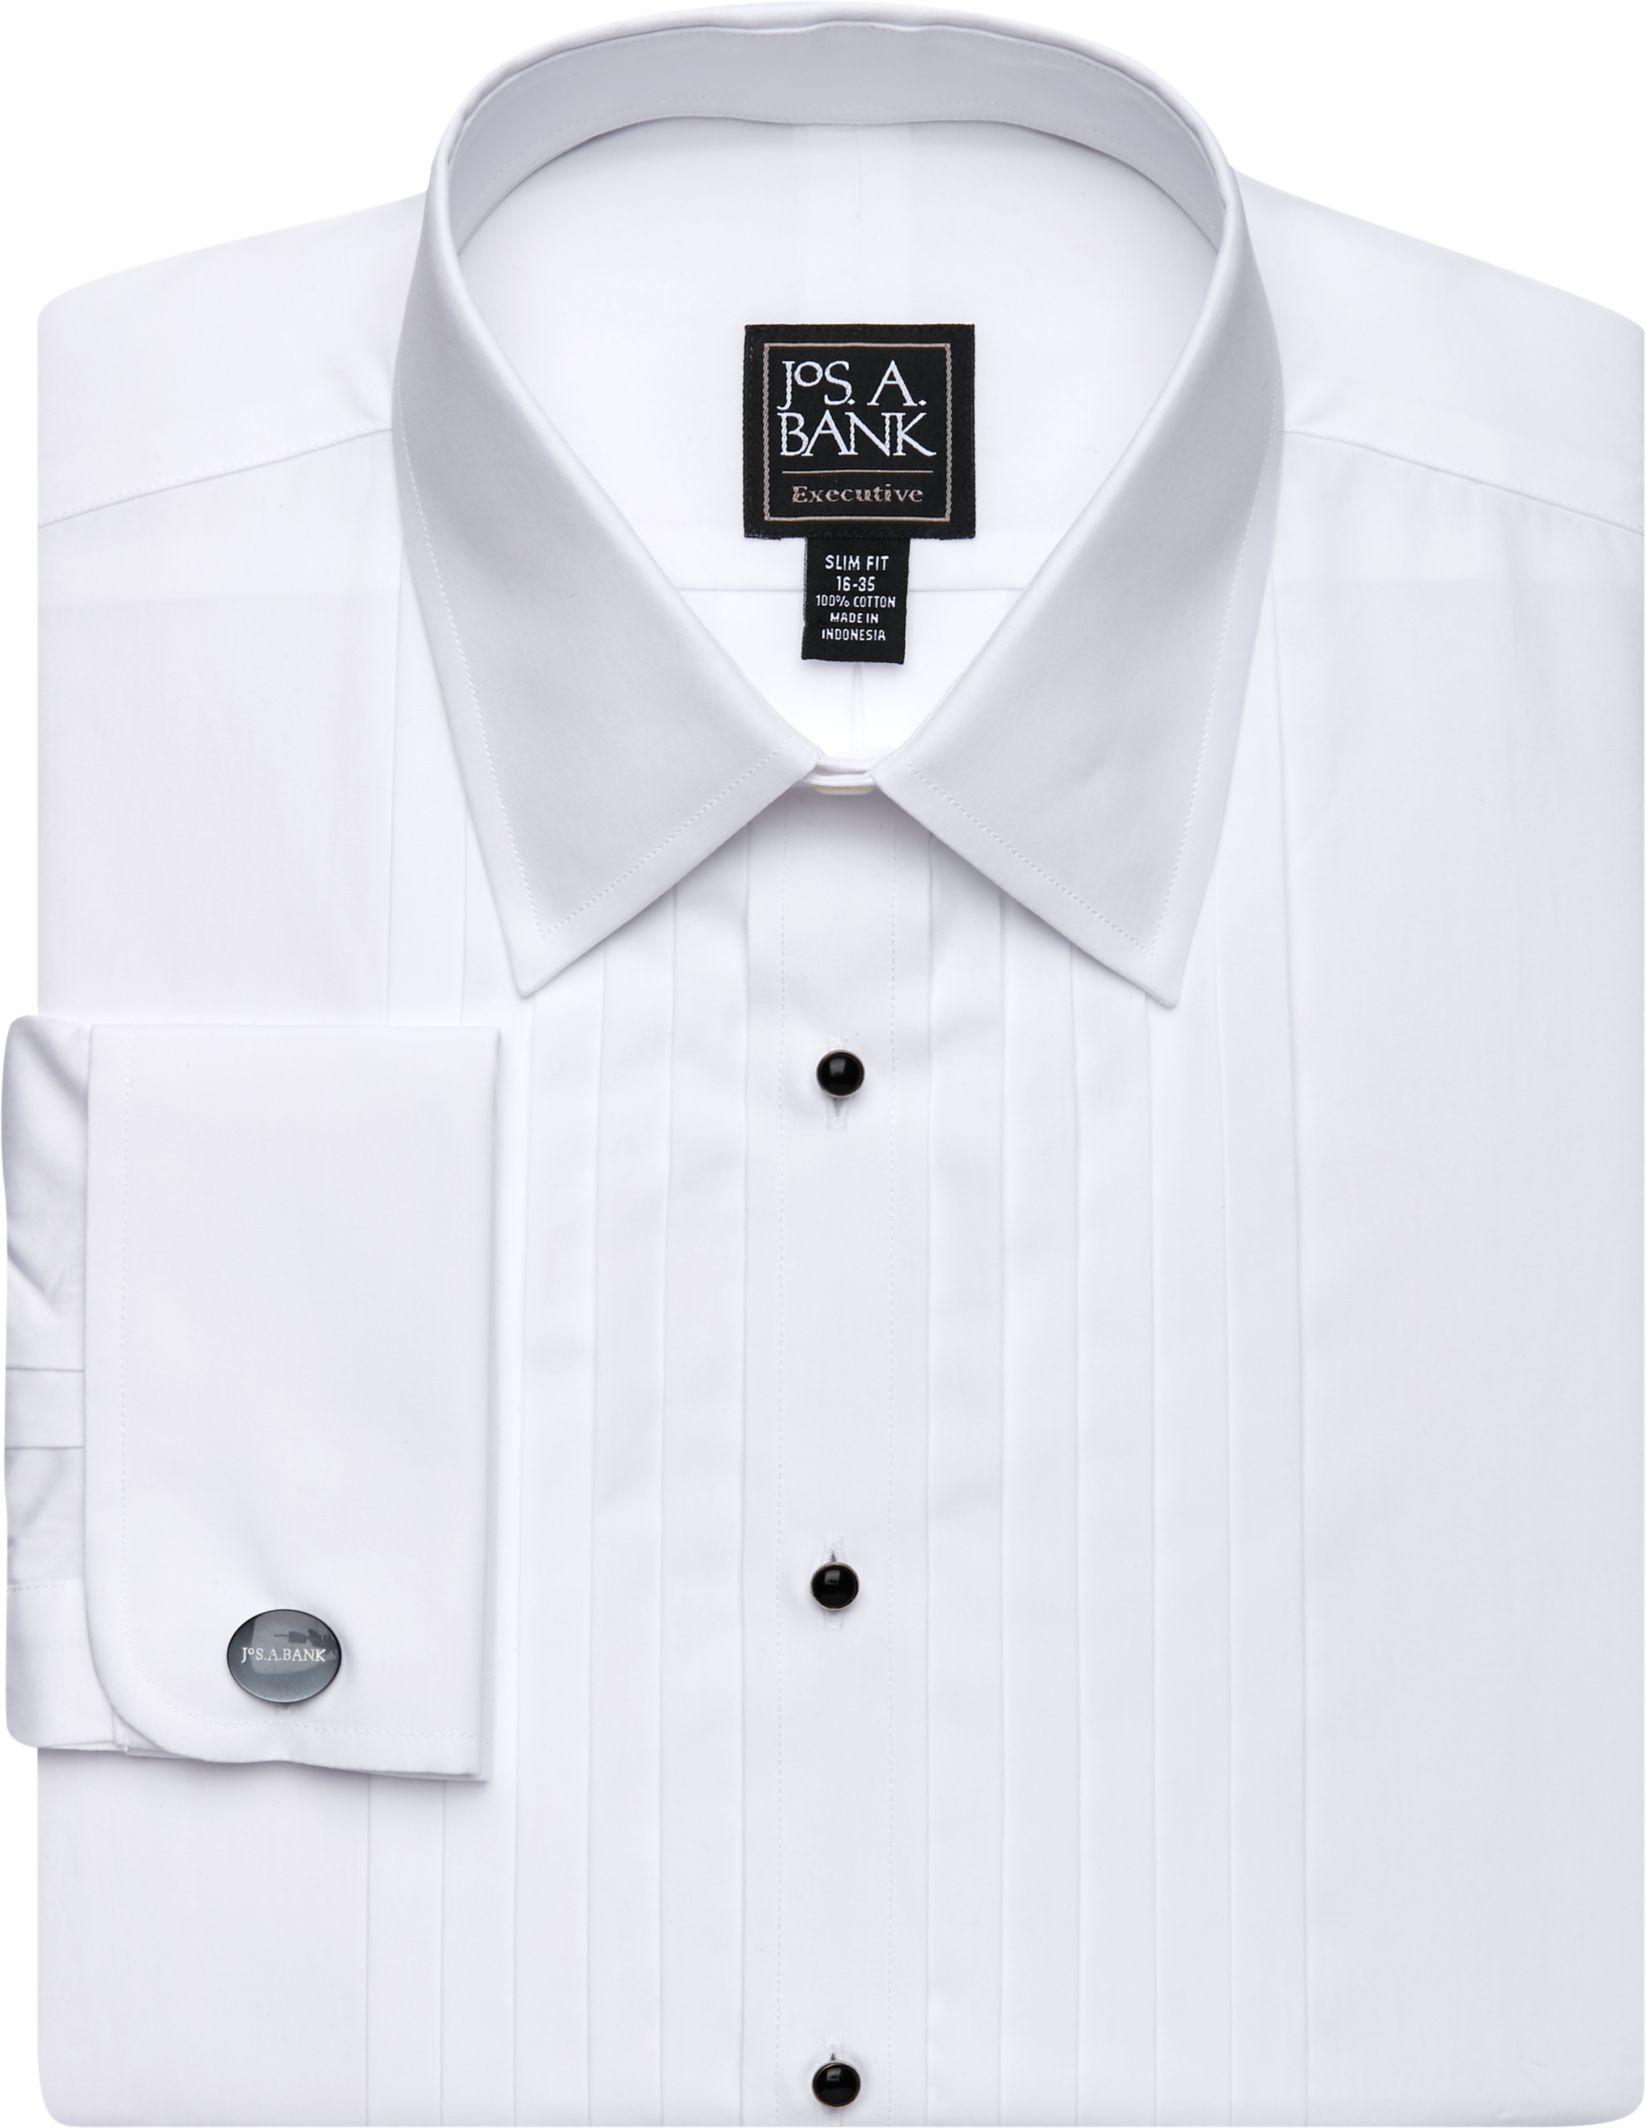 Tuxedo Dress Shirts Mens Formal Shirts Jos A Bank